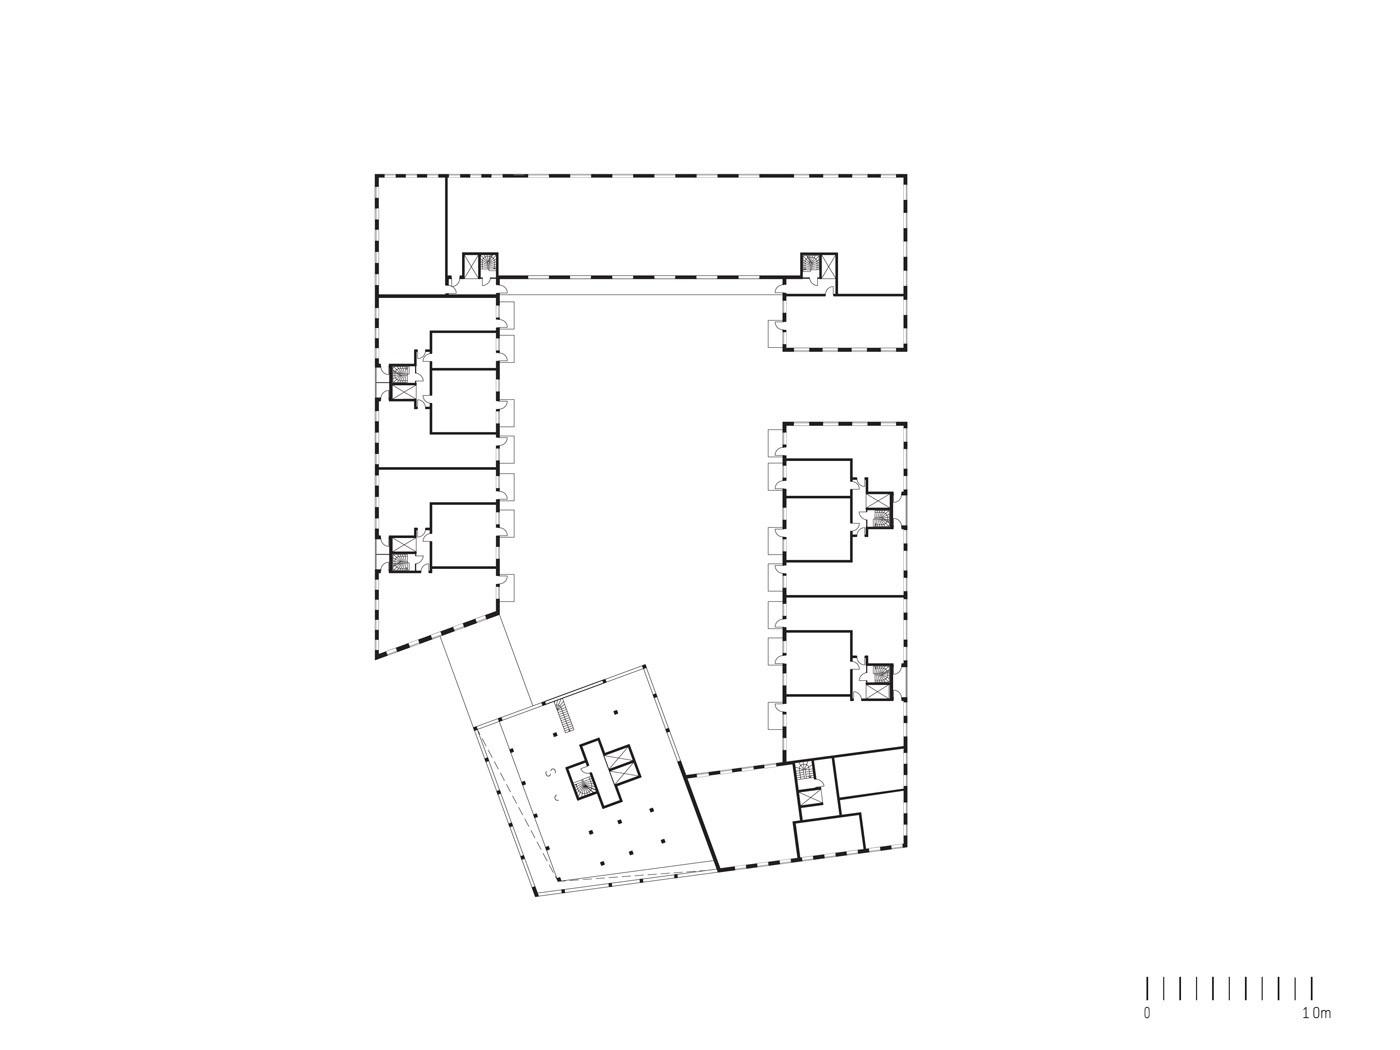 a-ripellino_handelsskepet_plan